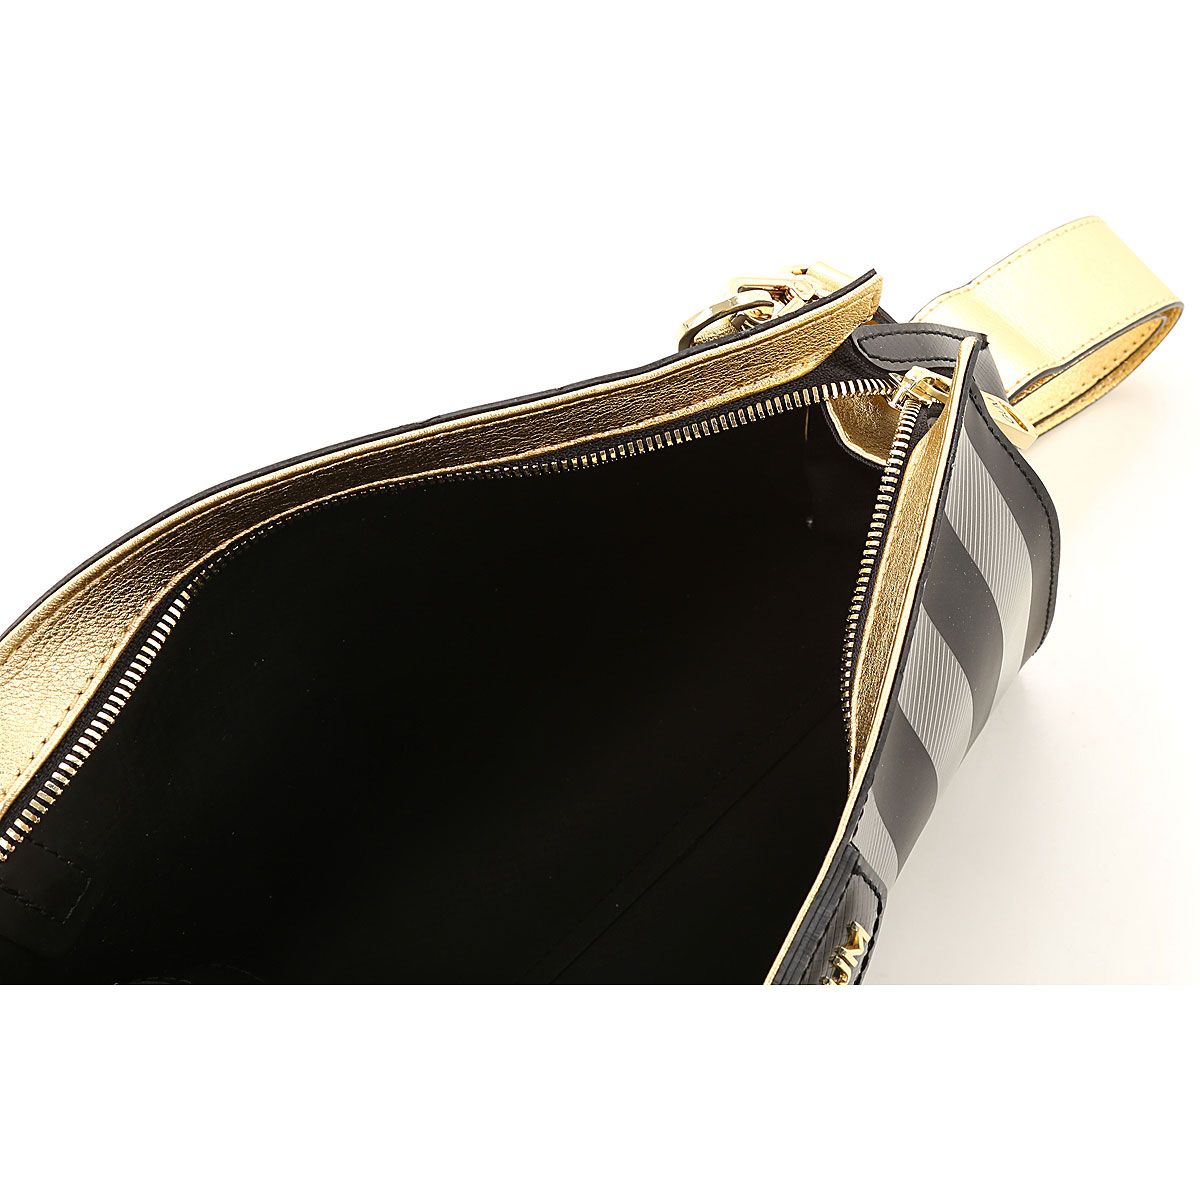 2019 Oro Chiarini Negro Gum Gianni Design Bolsos verano Carteras Primavera dorado 0x4Pfzn